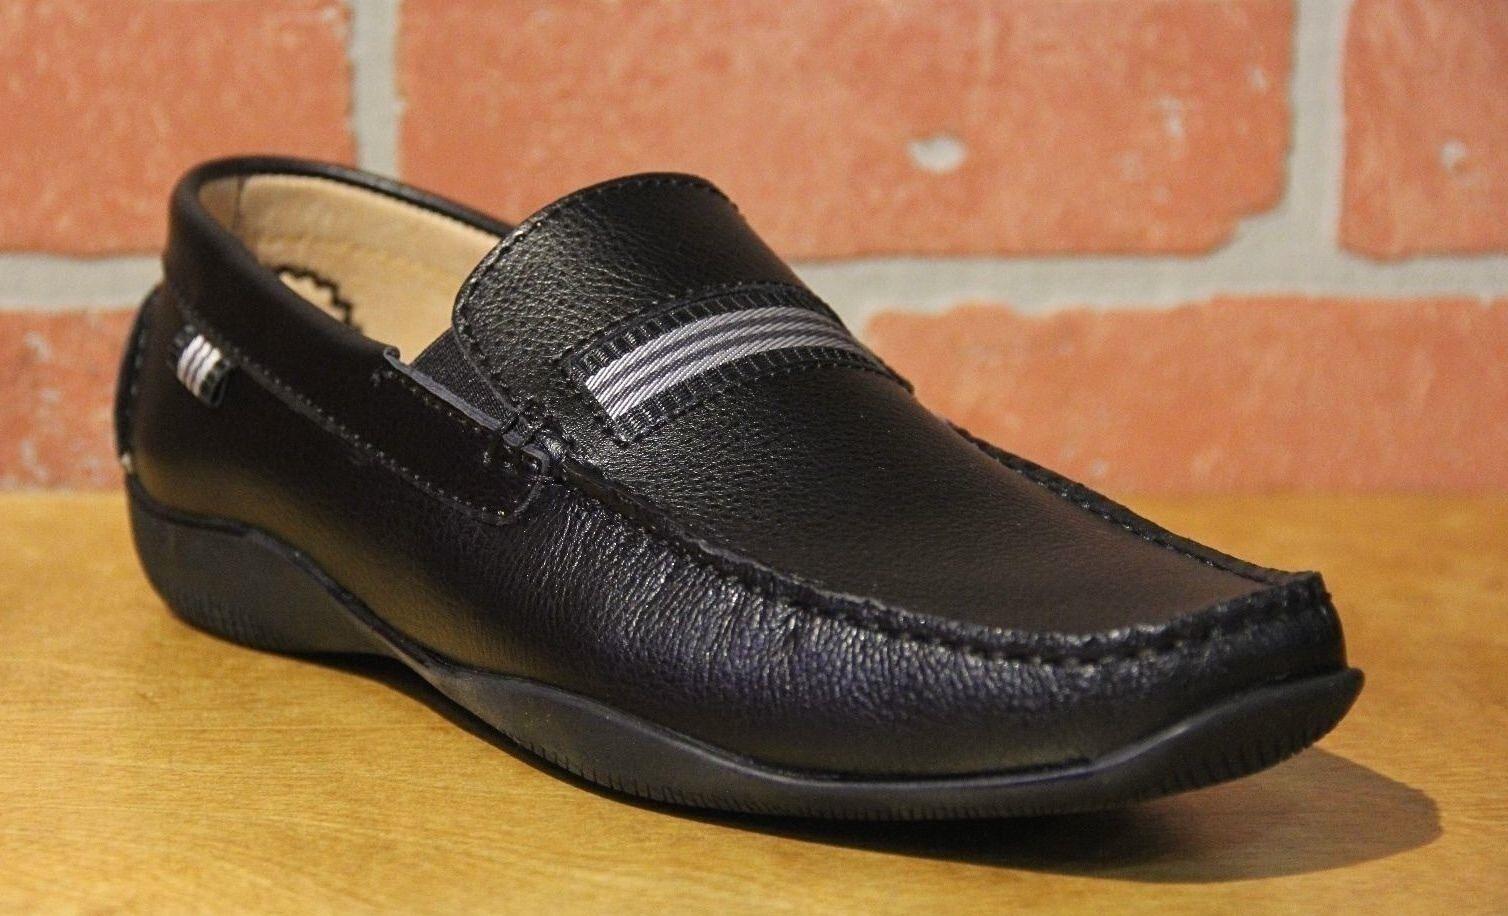 Salo New York Men's Slip On Black Soft Leather Stylish Moccasins TZ7296-16